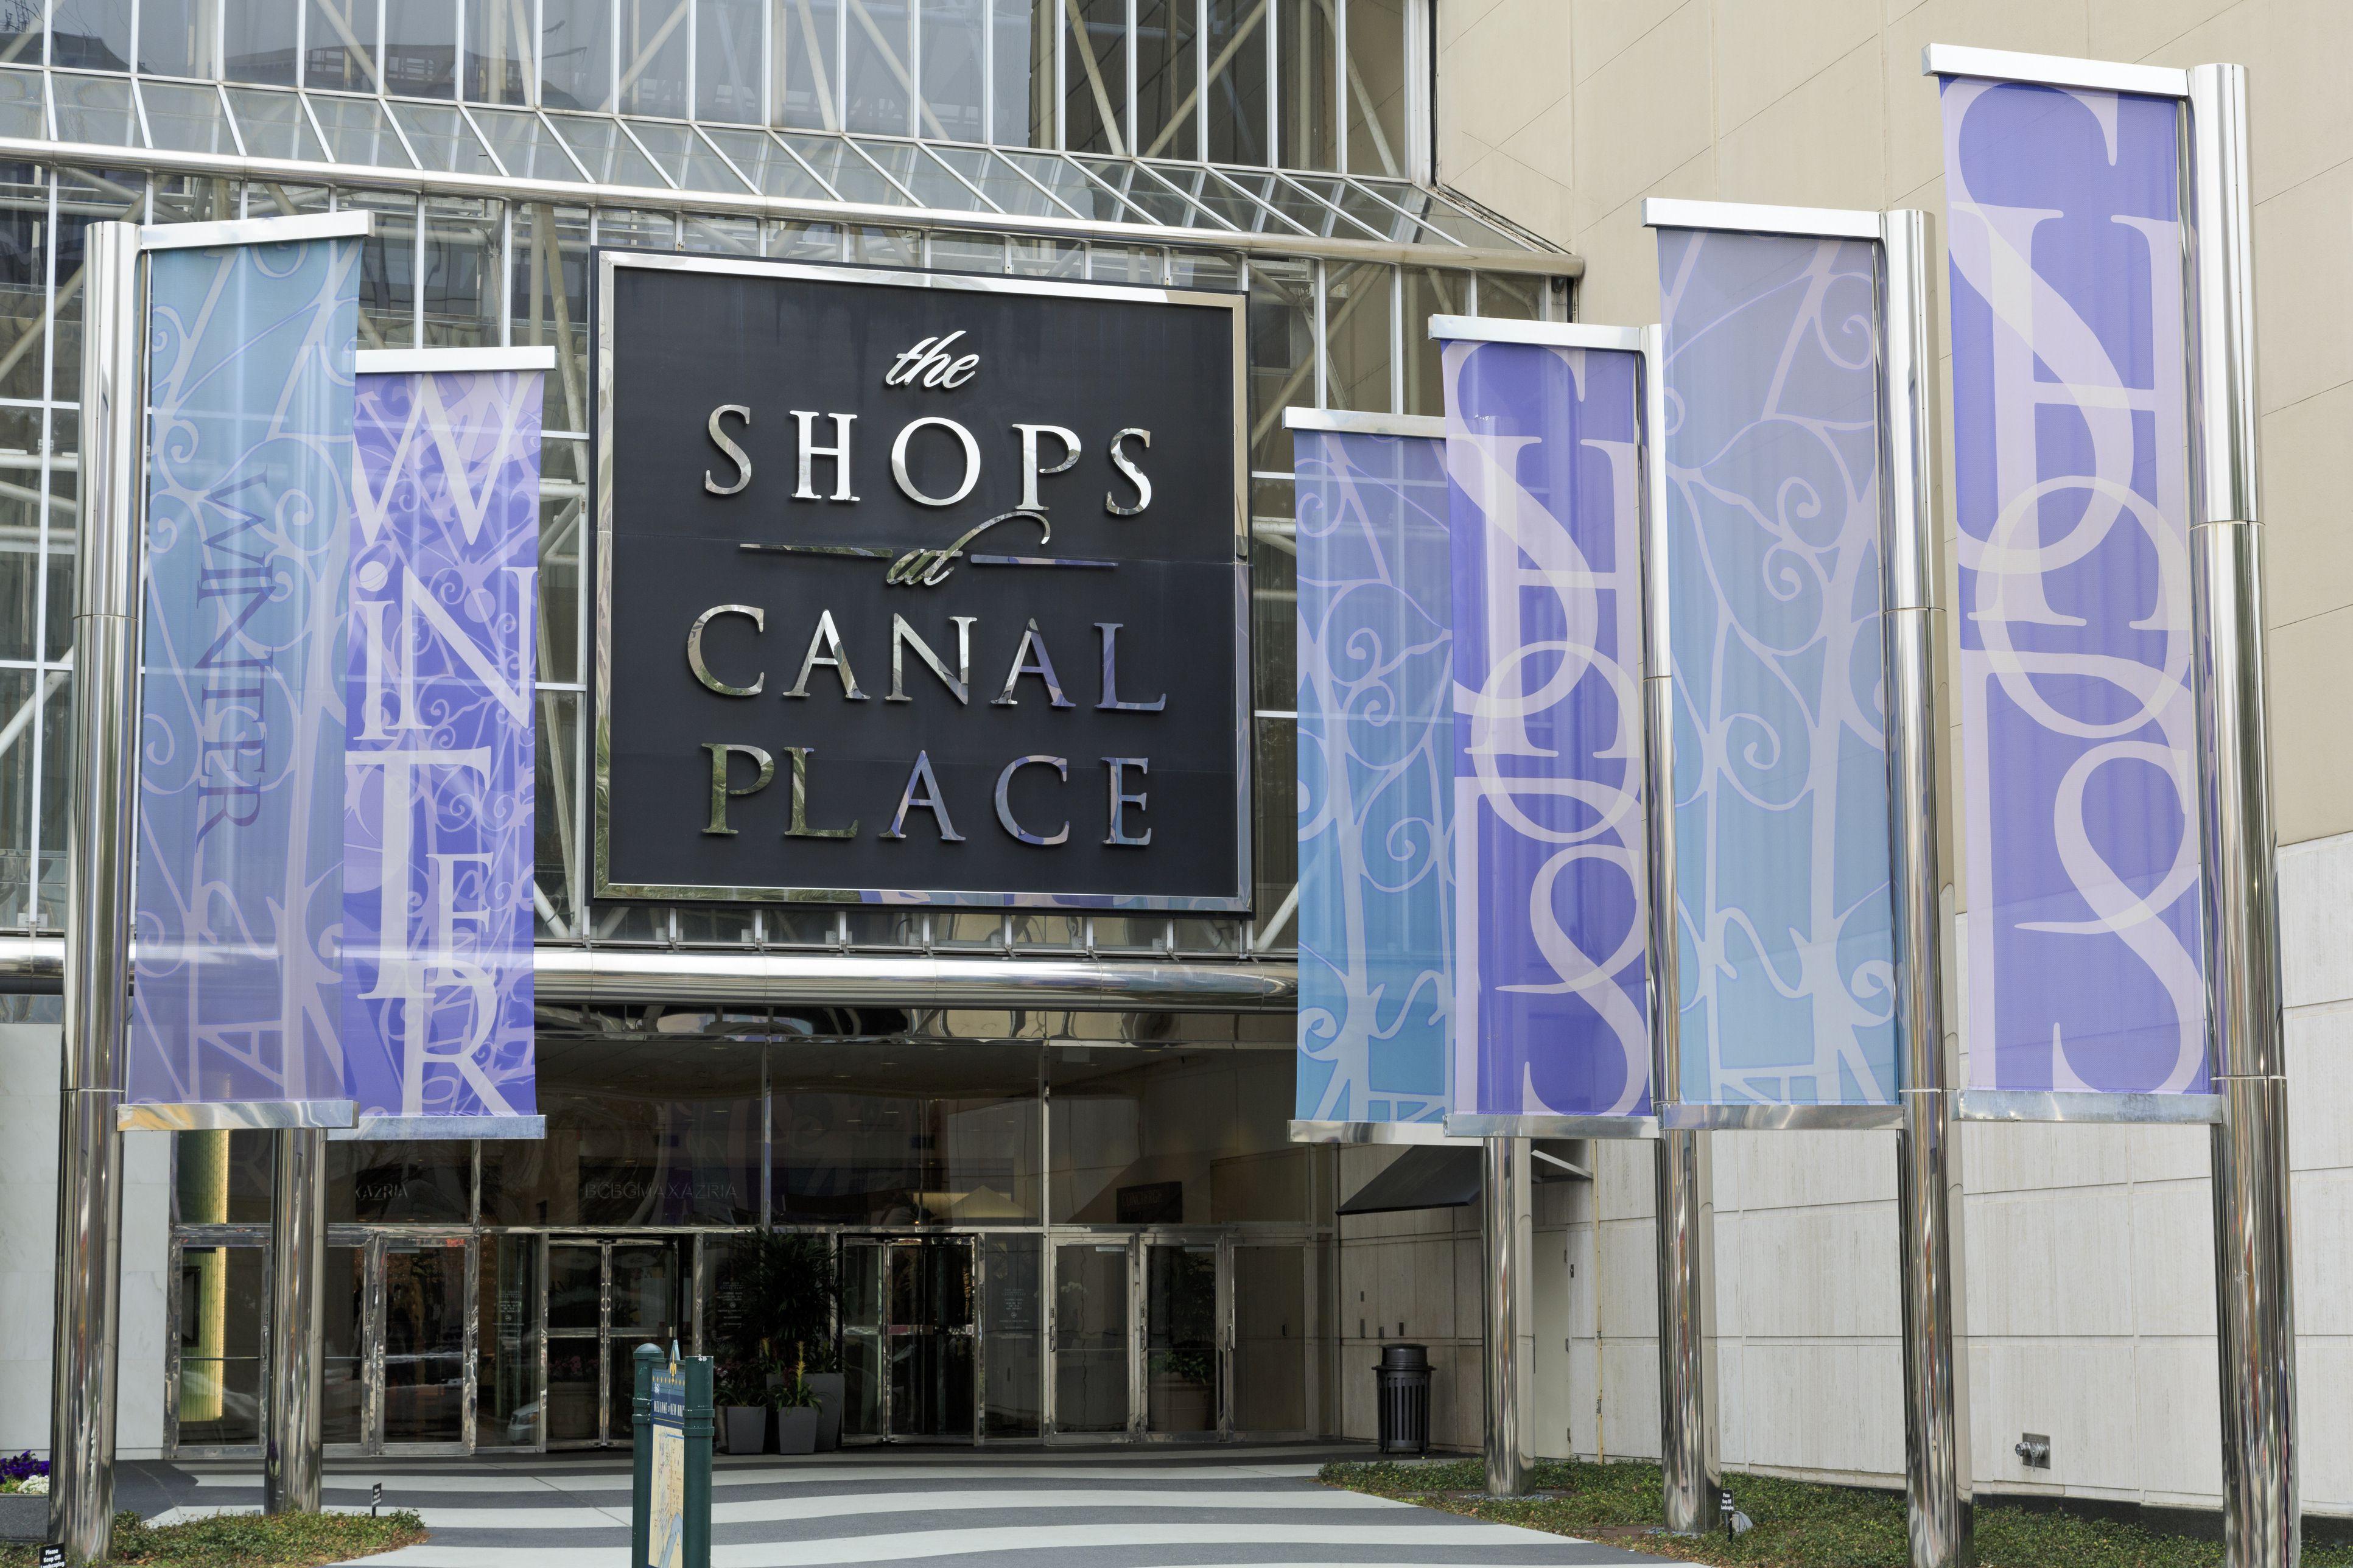 Canal Place Shops, Nueva Orleans, Louisiana